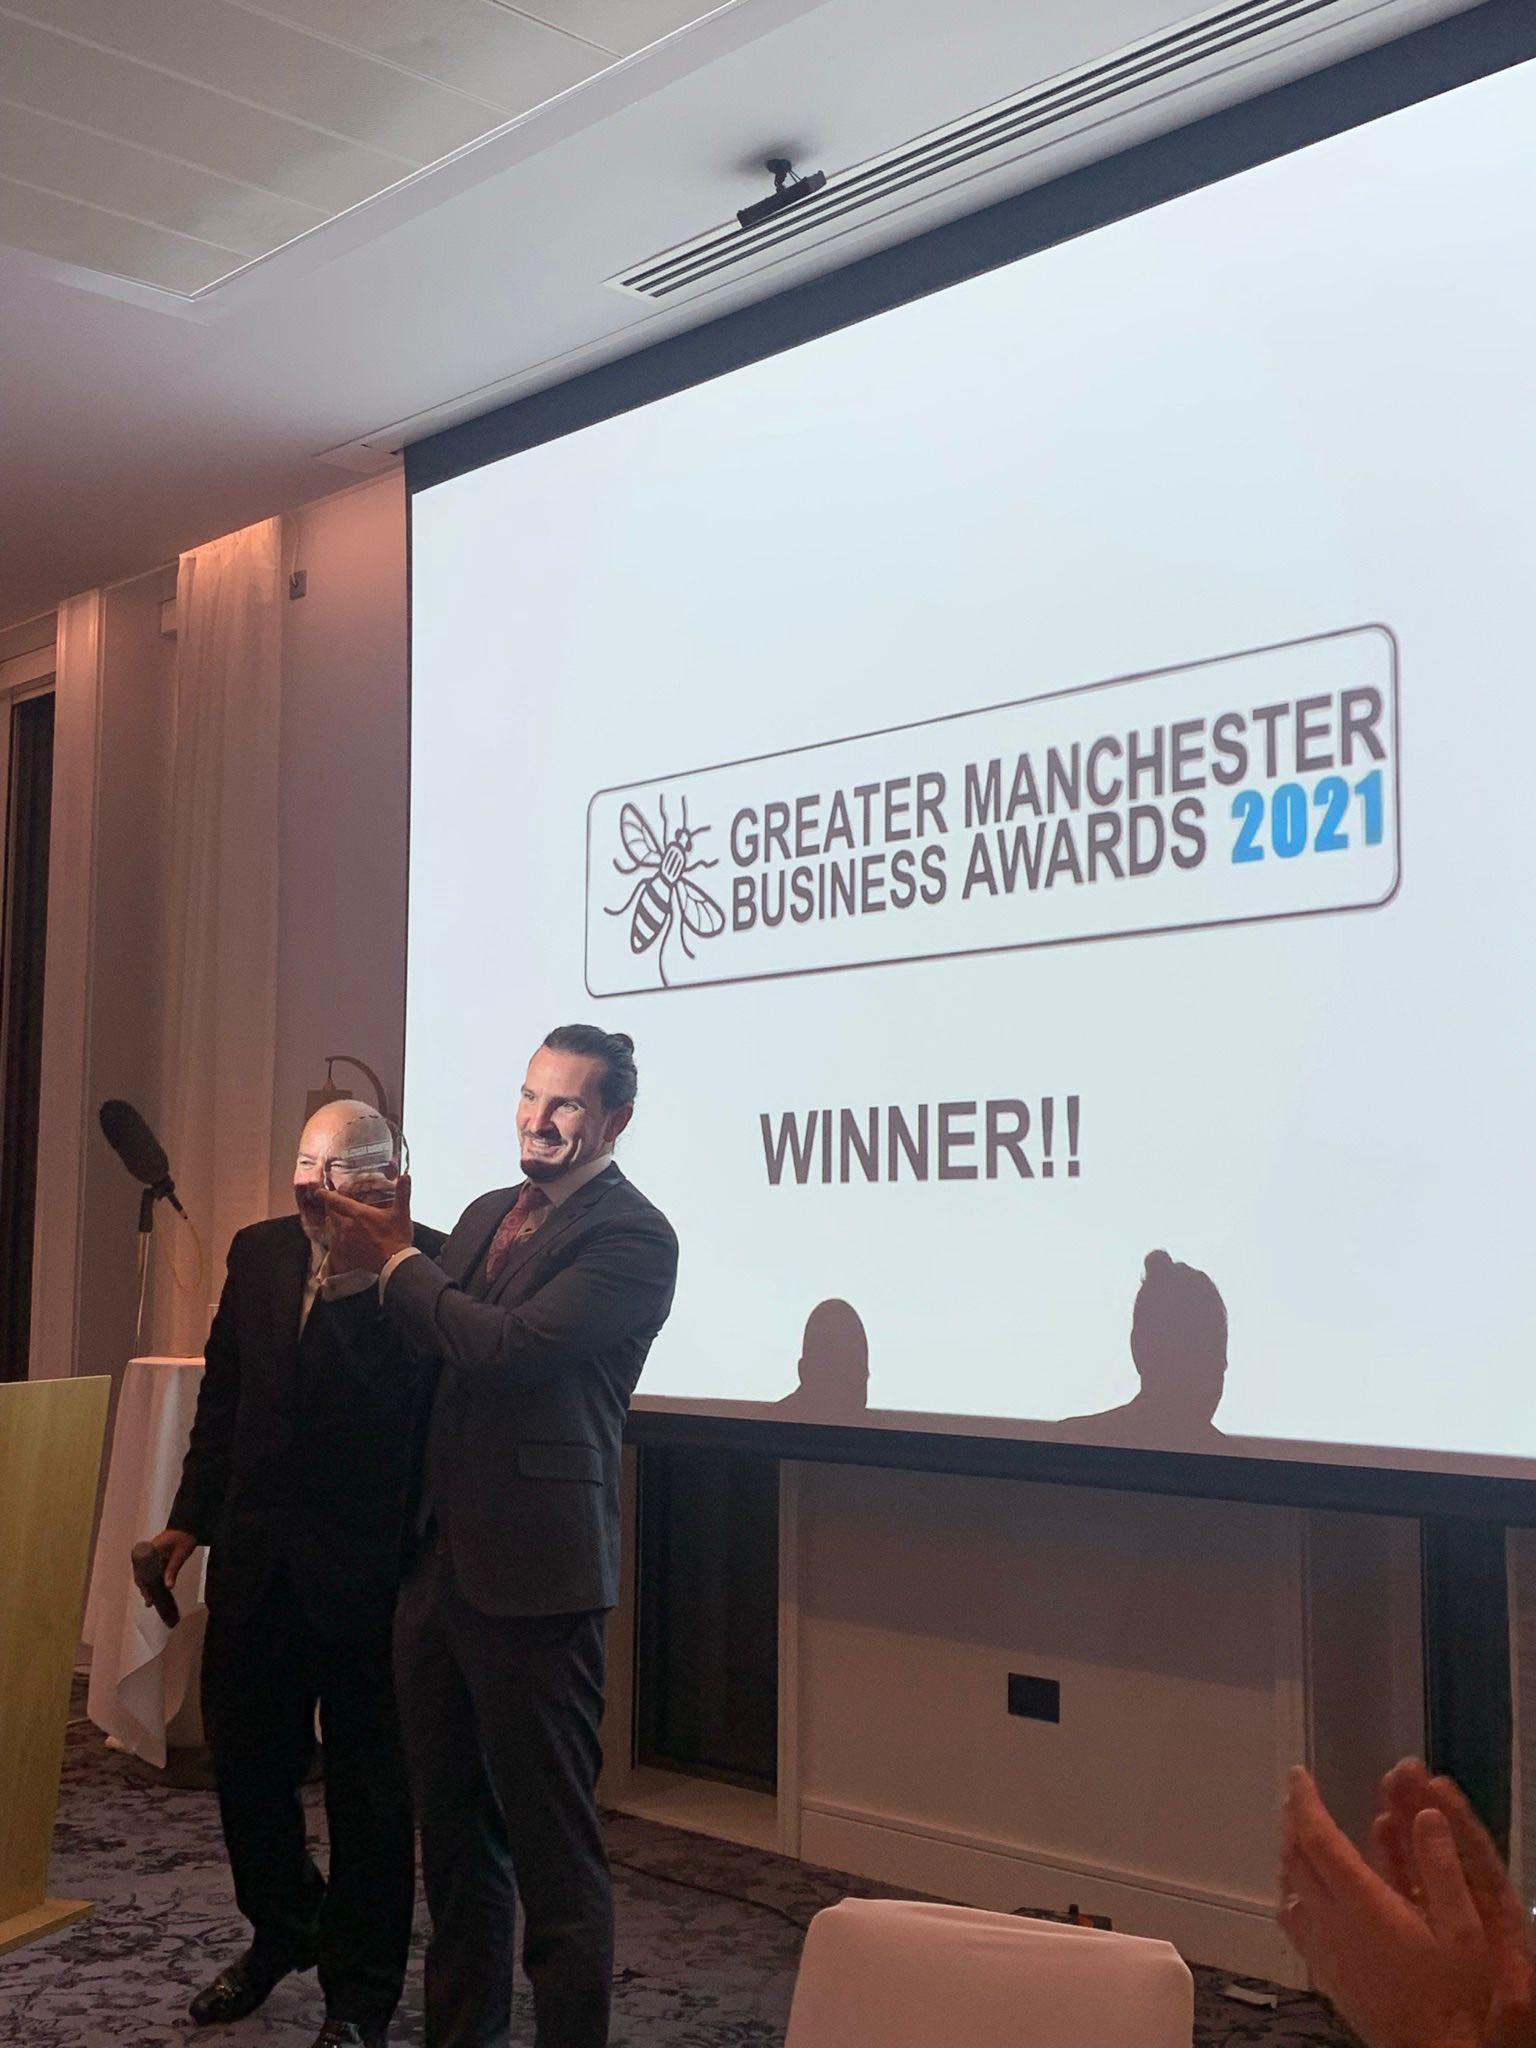 Winner of Masterchef Australia 2010, Adam Liaw, celebrates